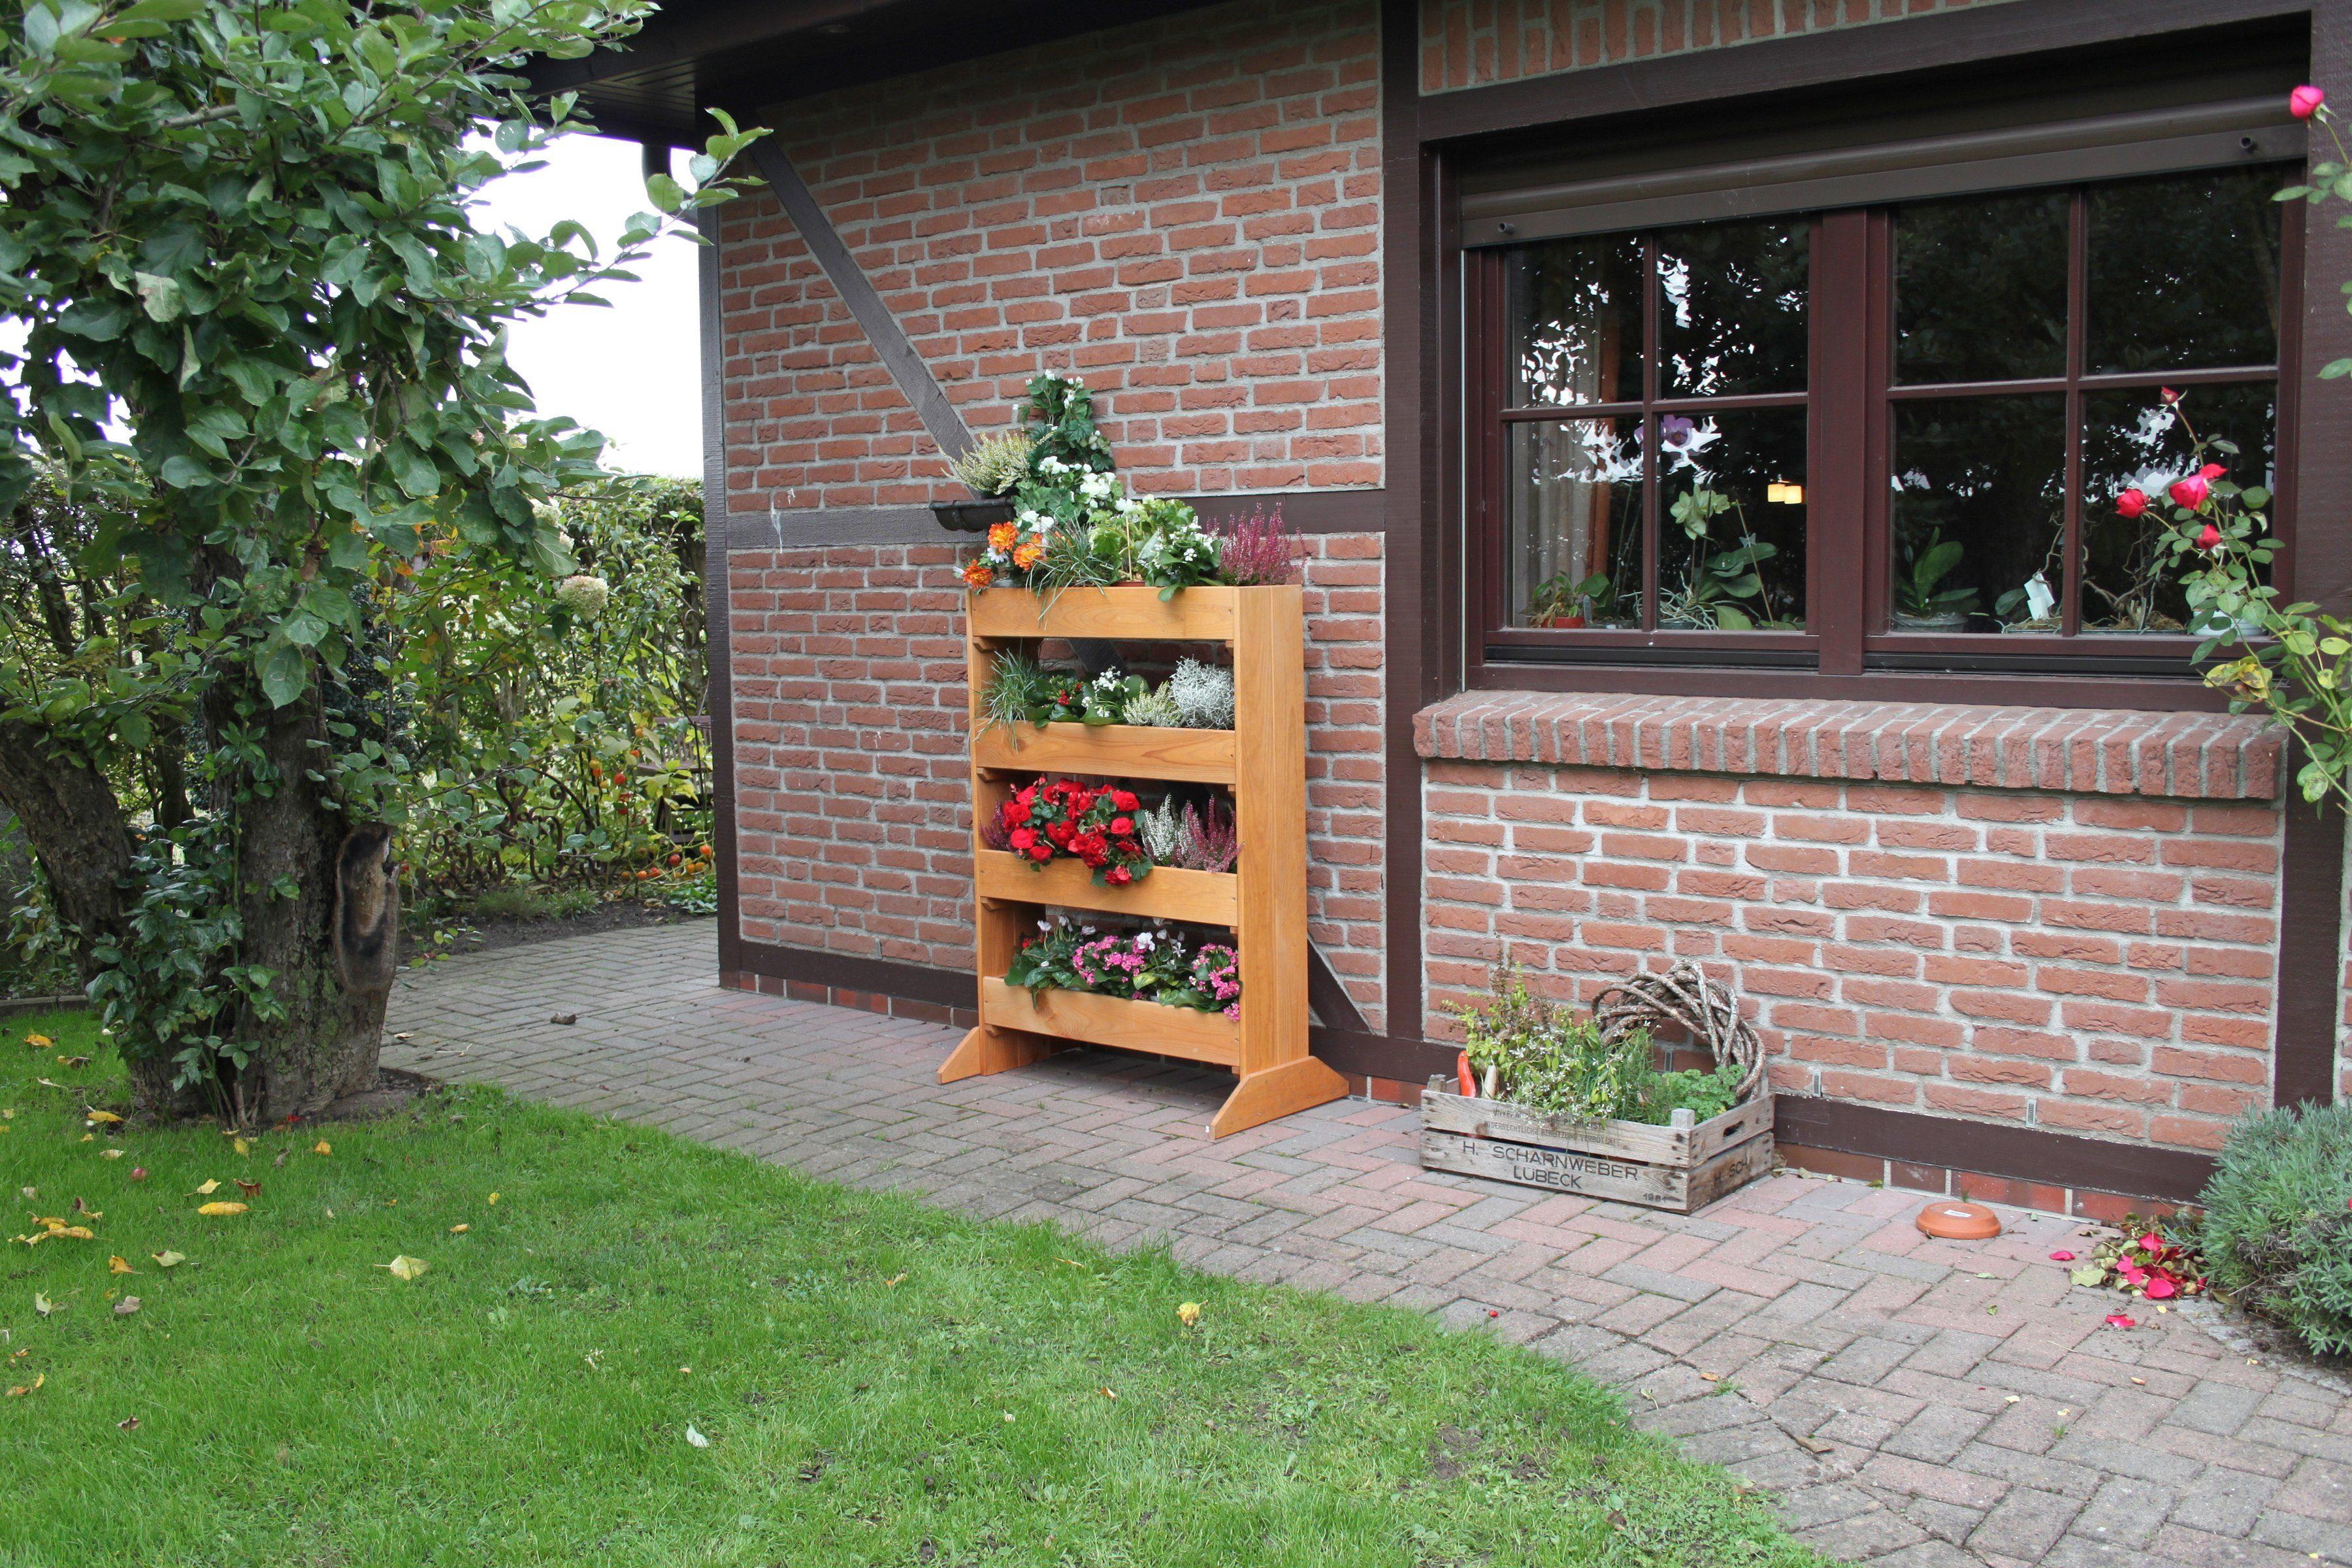 PROMADINO Blumentreppe , Vertikalbeet, BxTxH: 84x50x120 cm